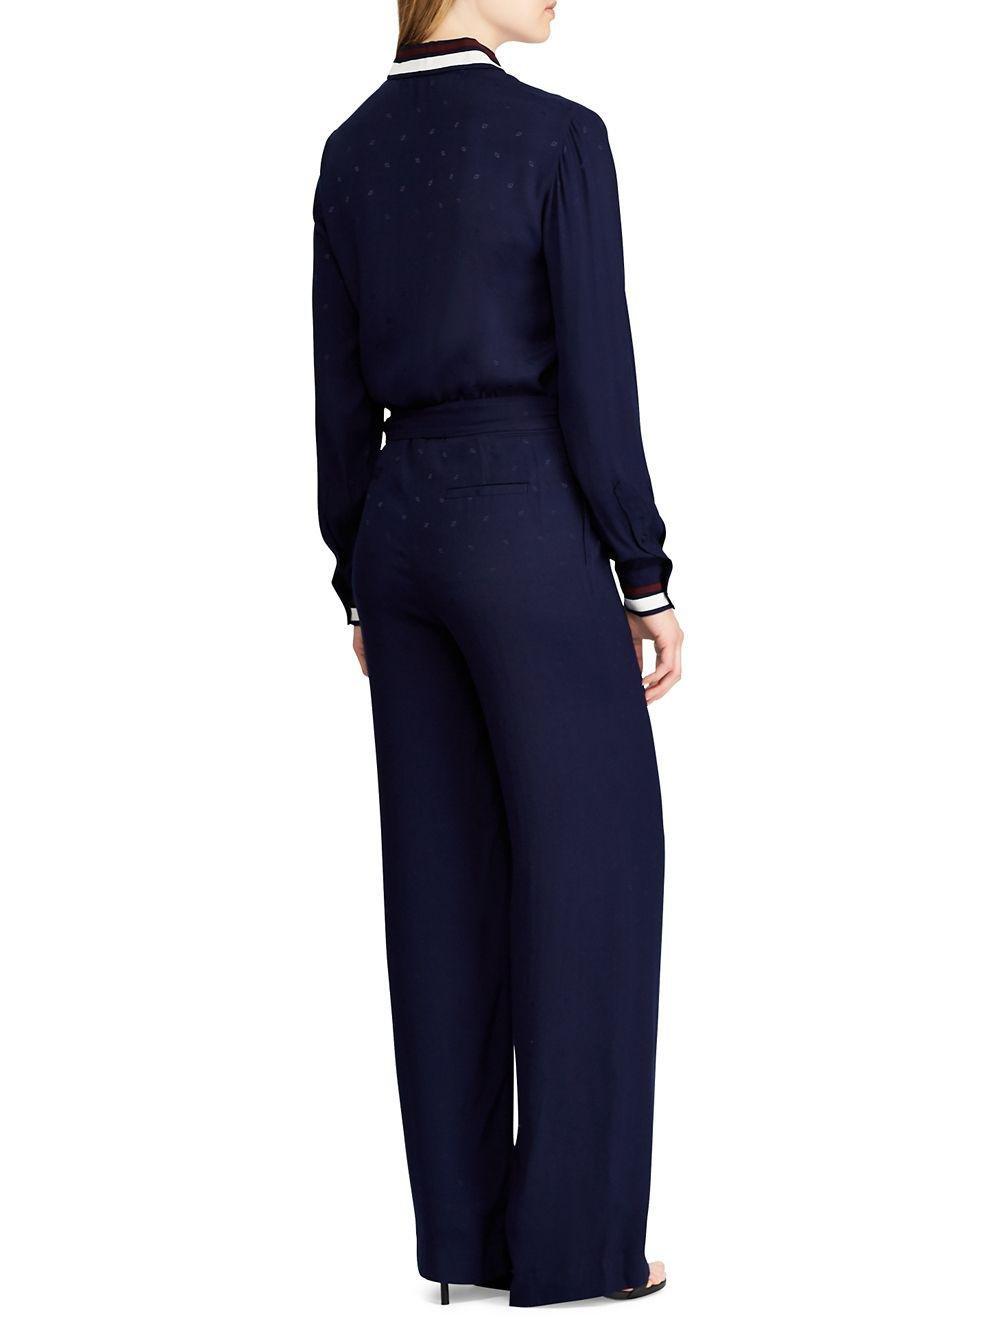 287e5cd2fc2 Lyst - Lauren By Ralph Lauren Stripe-trimmed Jacquard Jumpsuit in Blue